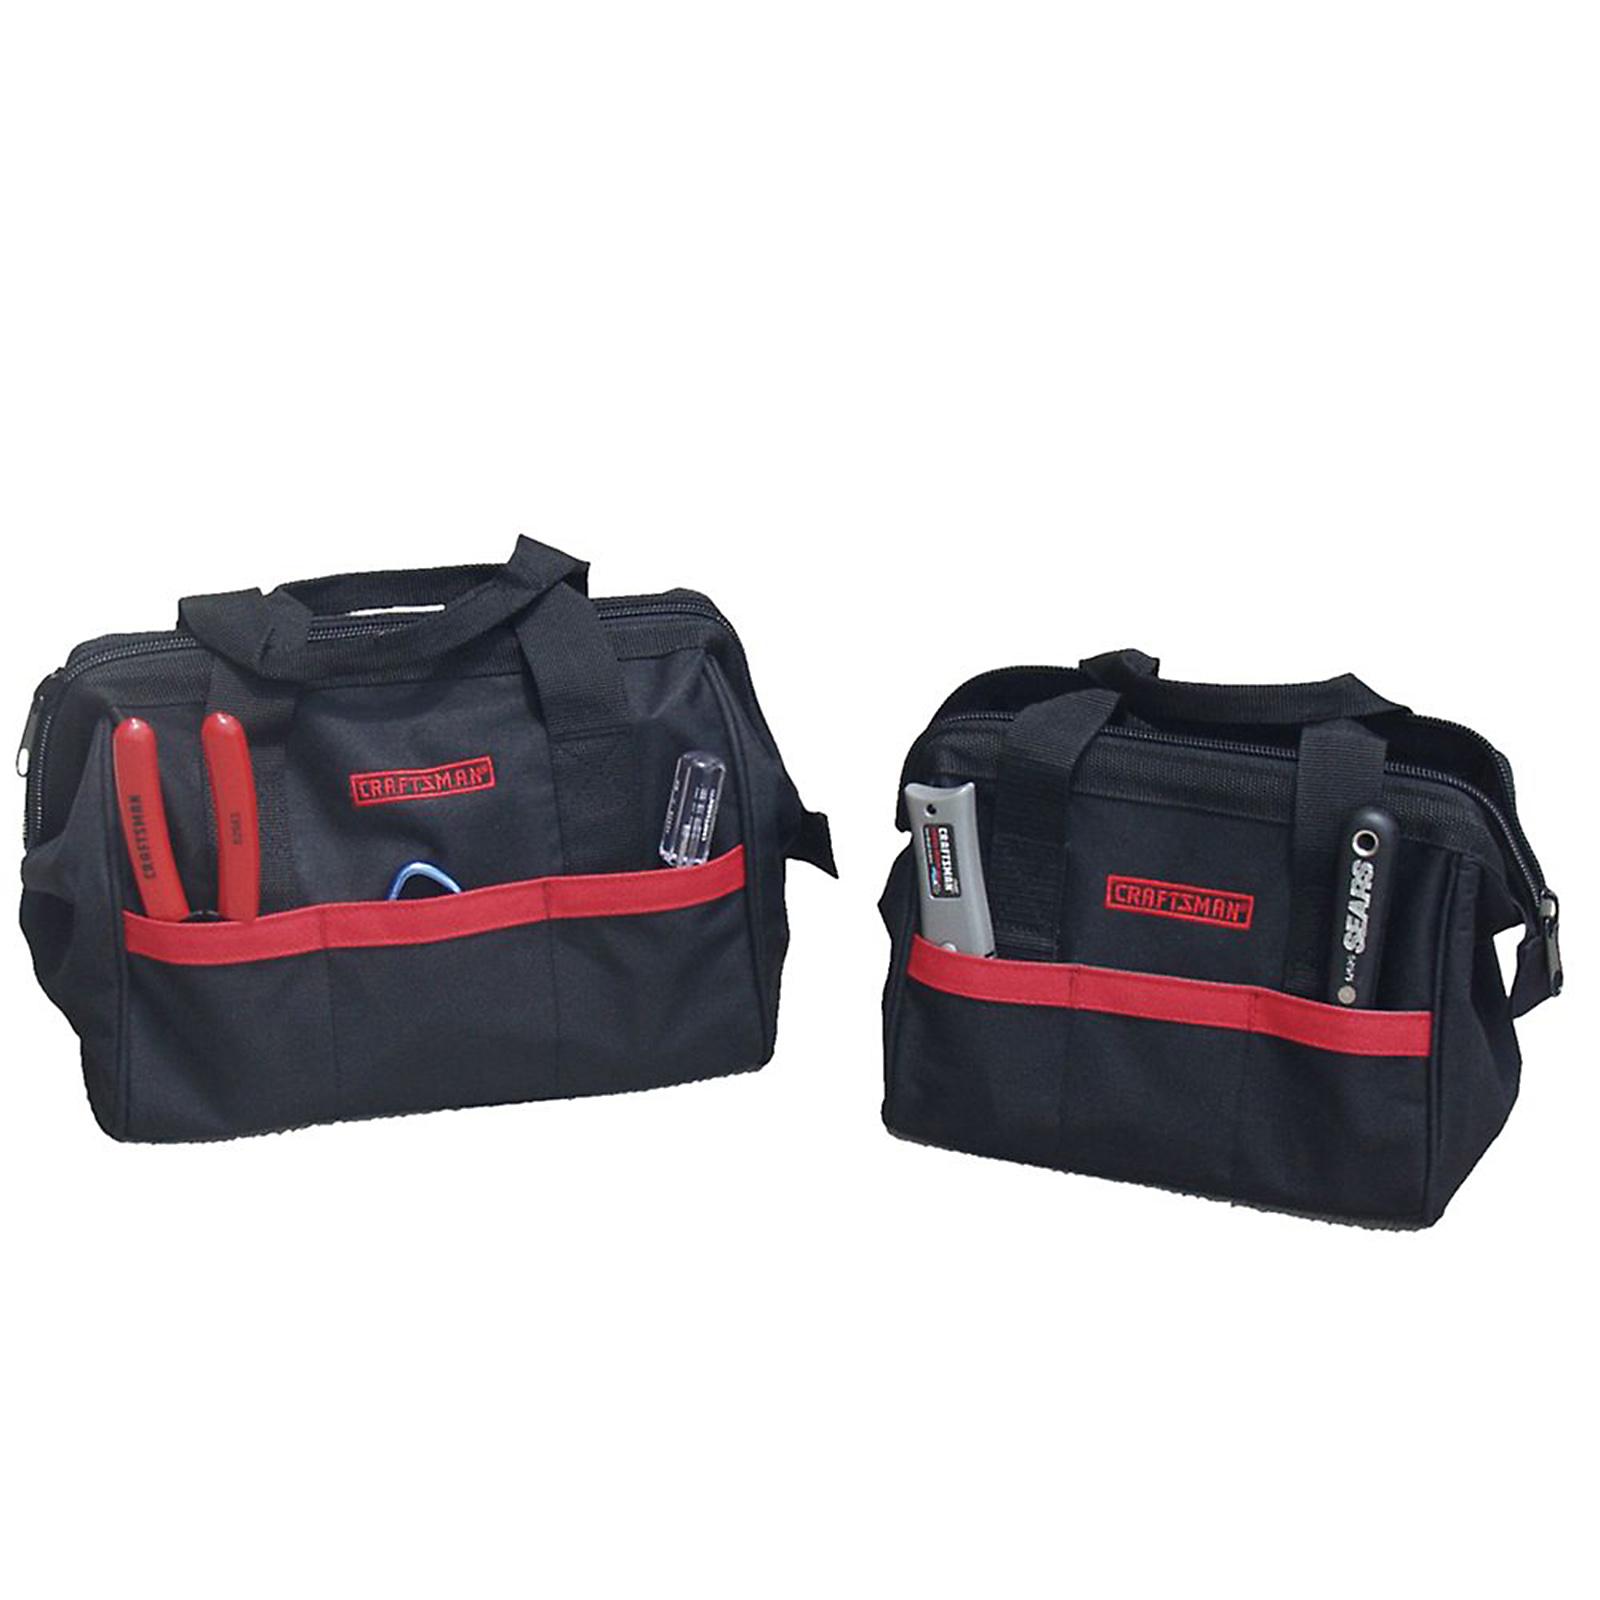 Tool Bag Combo Sears